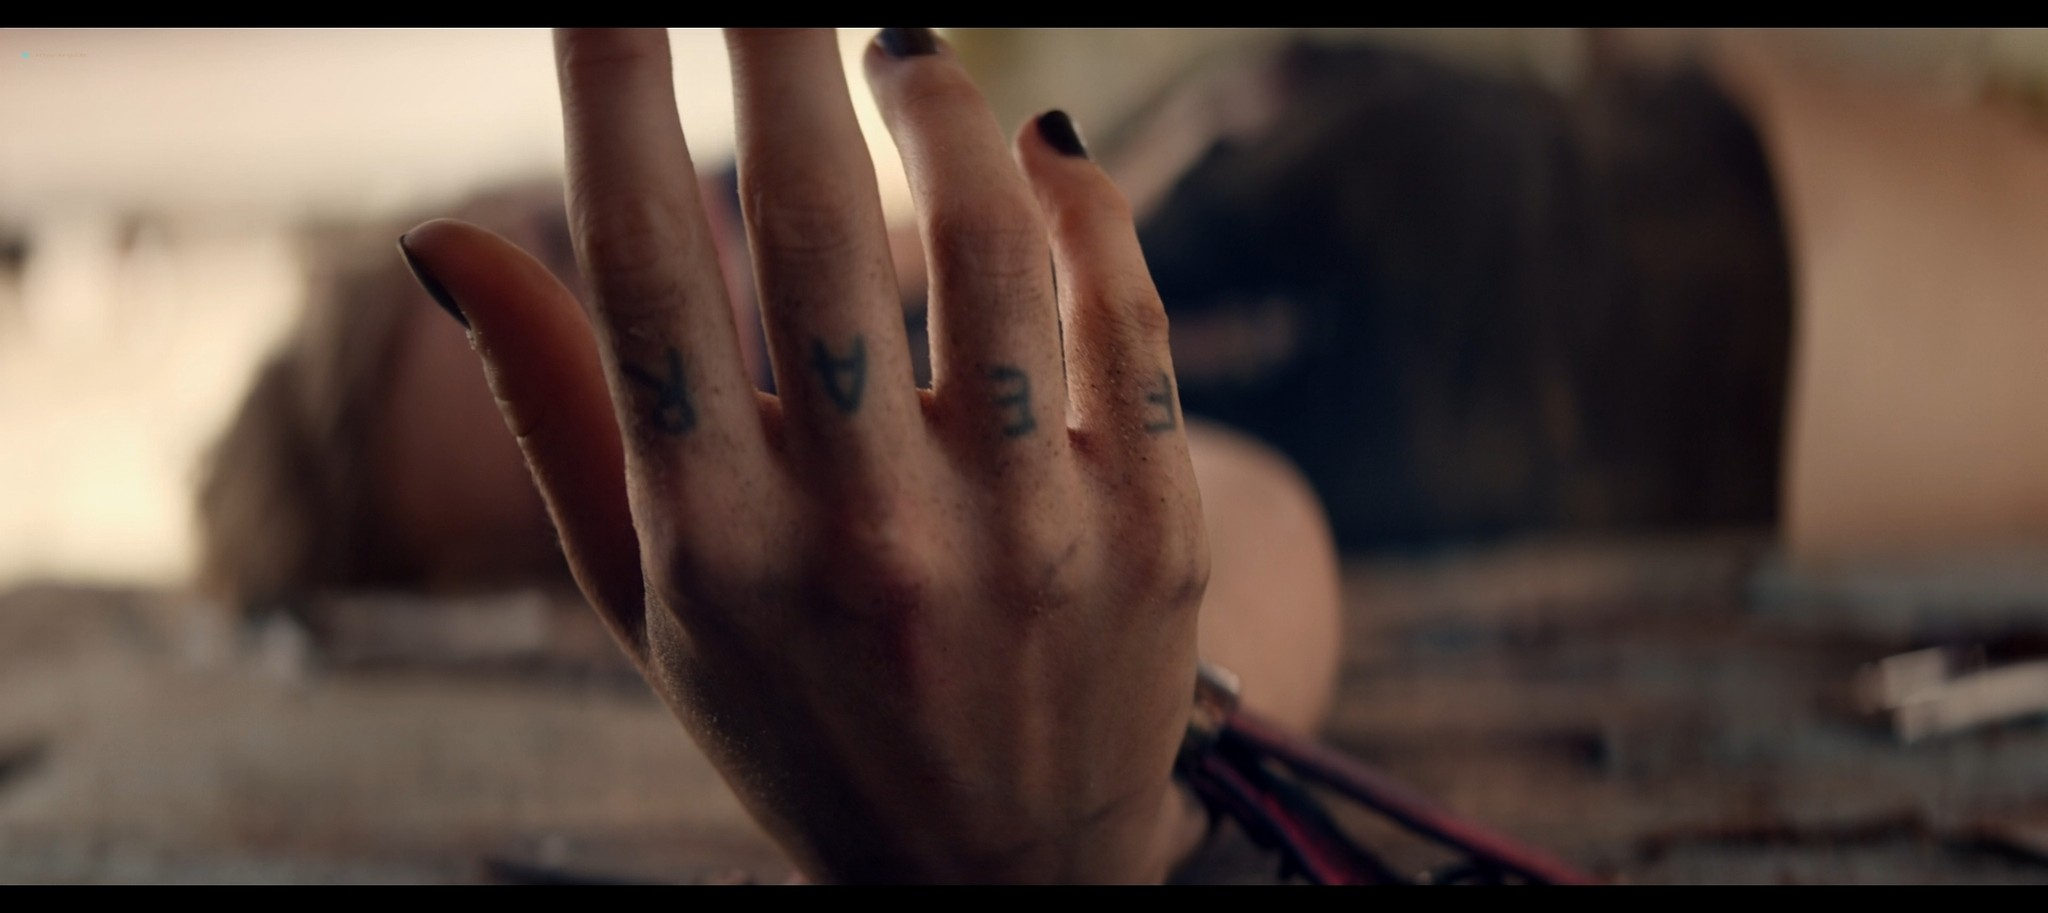 Suki Waterhouse sexy The Bad Batch 2016 1080p BluRay REMUX 8